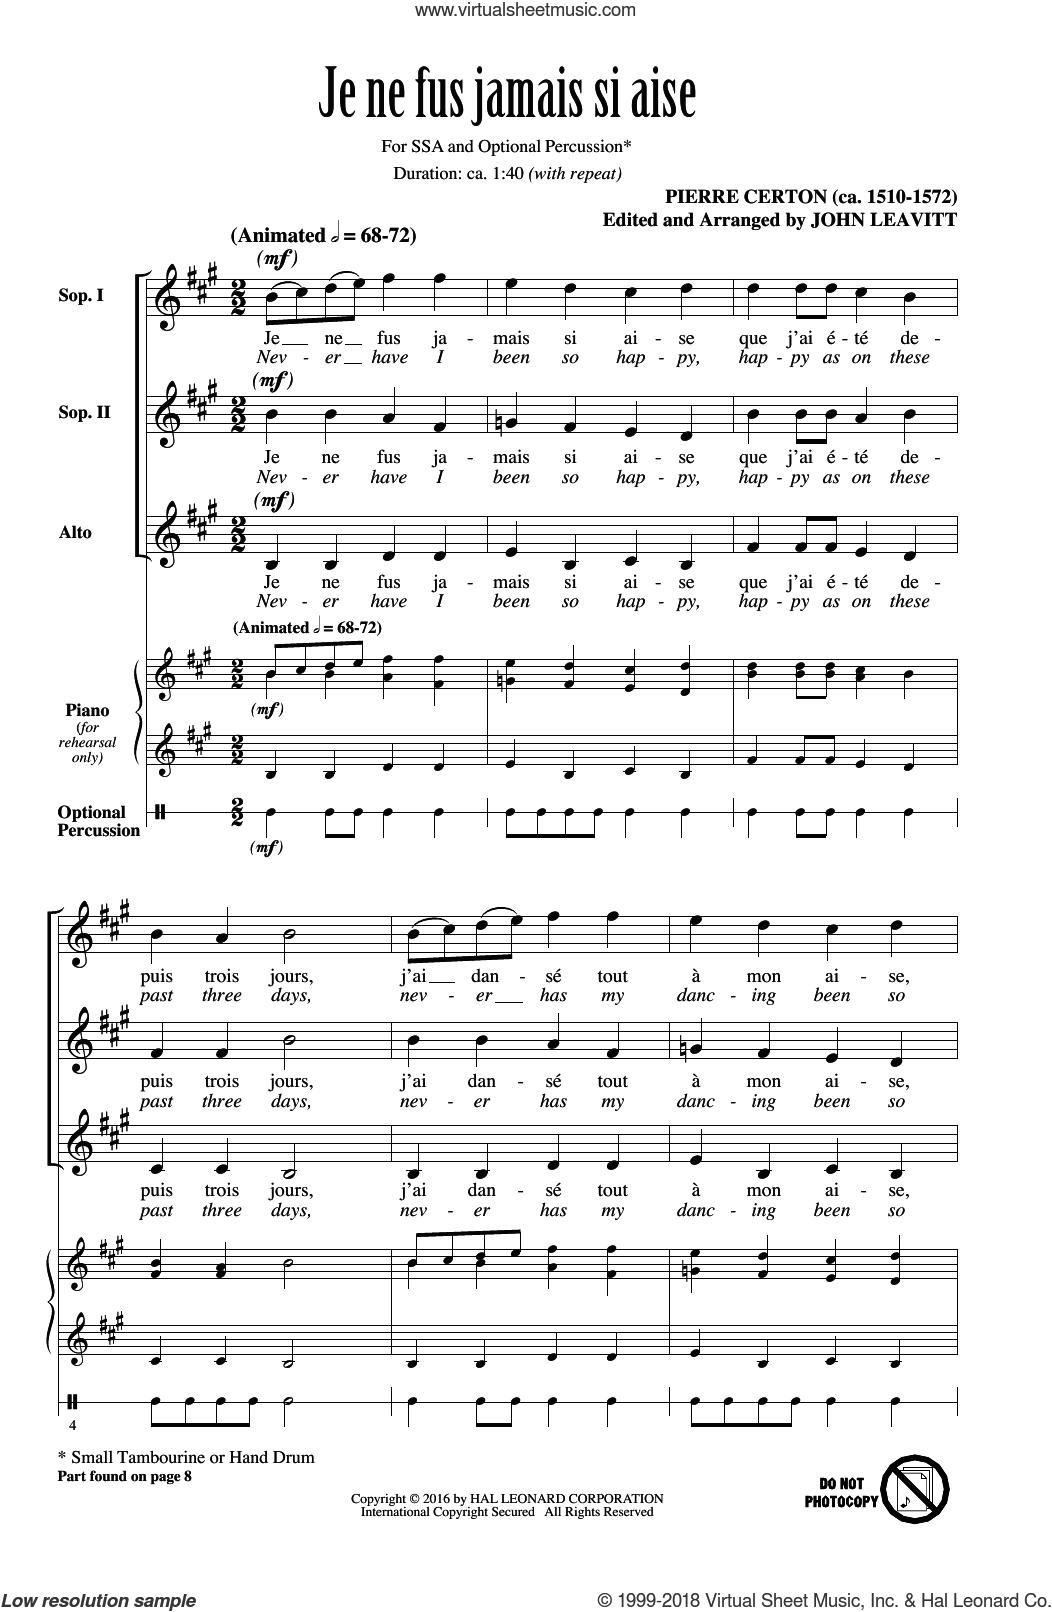 Je Ne Fus Jamais Si Aise sheet music for choir (SSA: soprano, alto) by Pierre Certon and John Leavitt, intermediate skill level